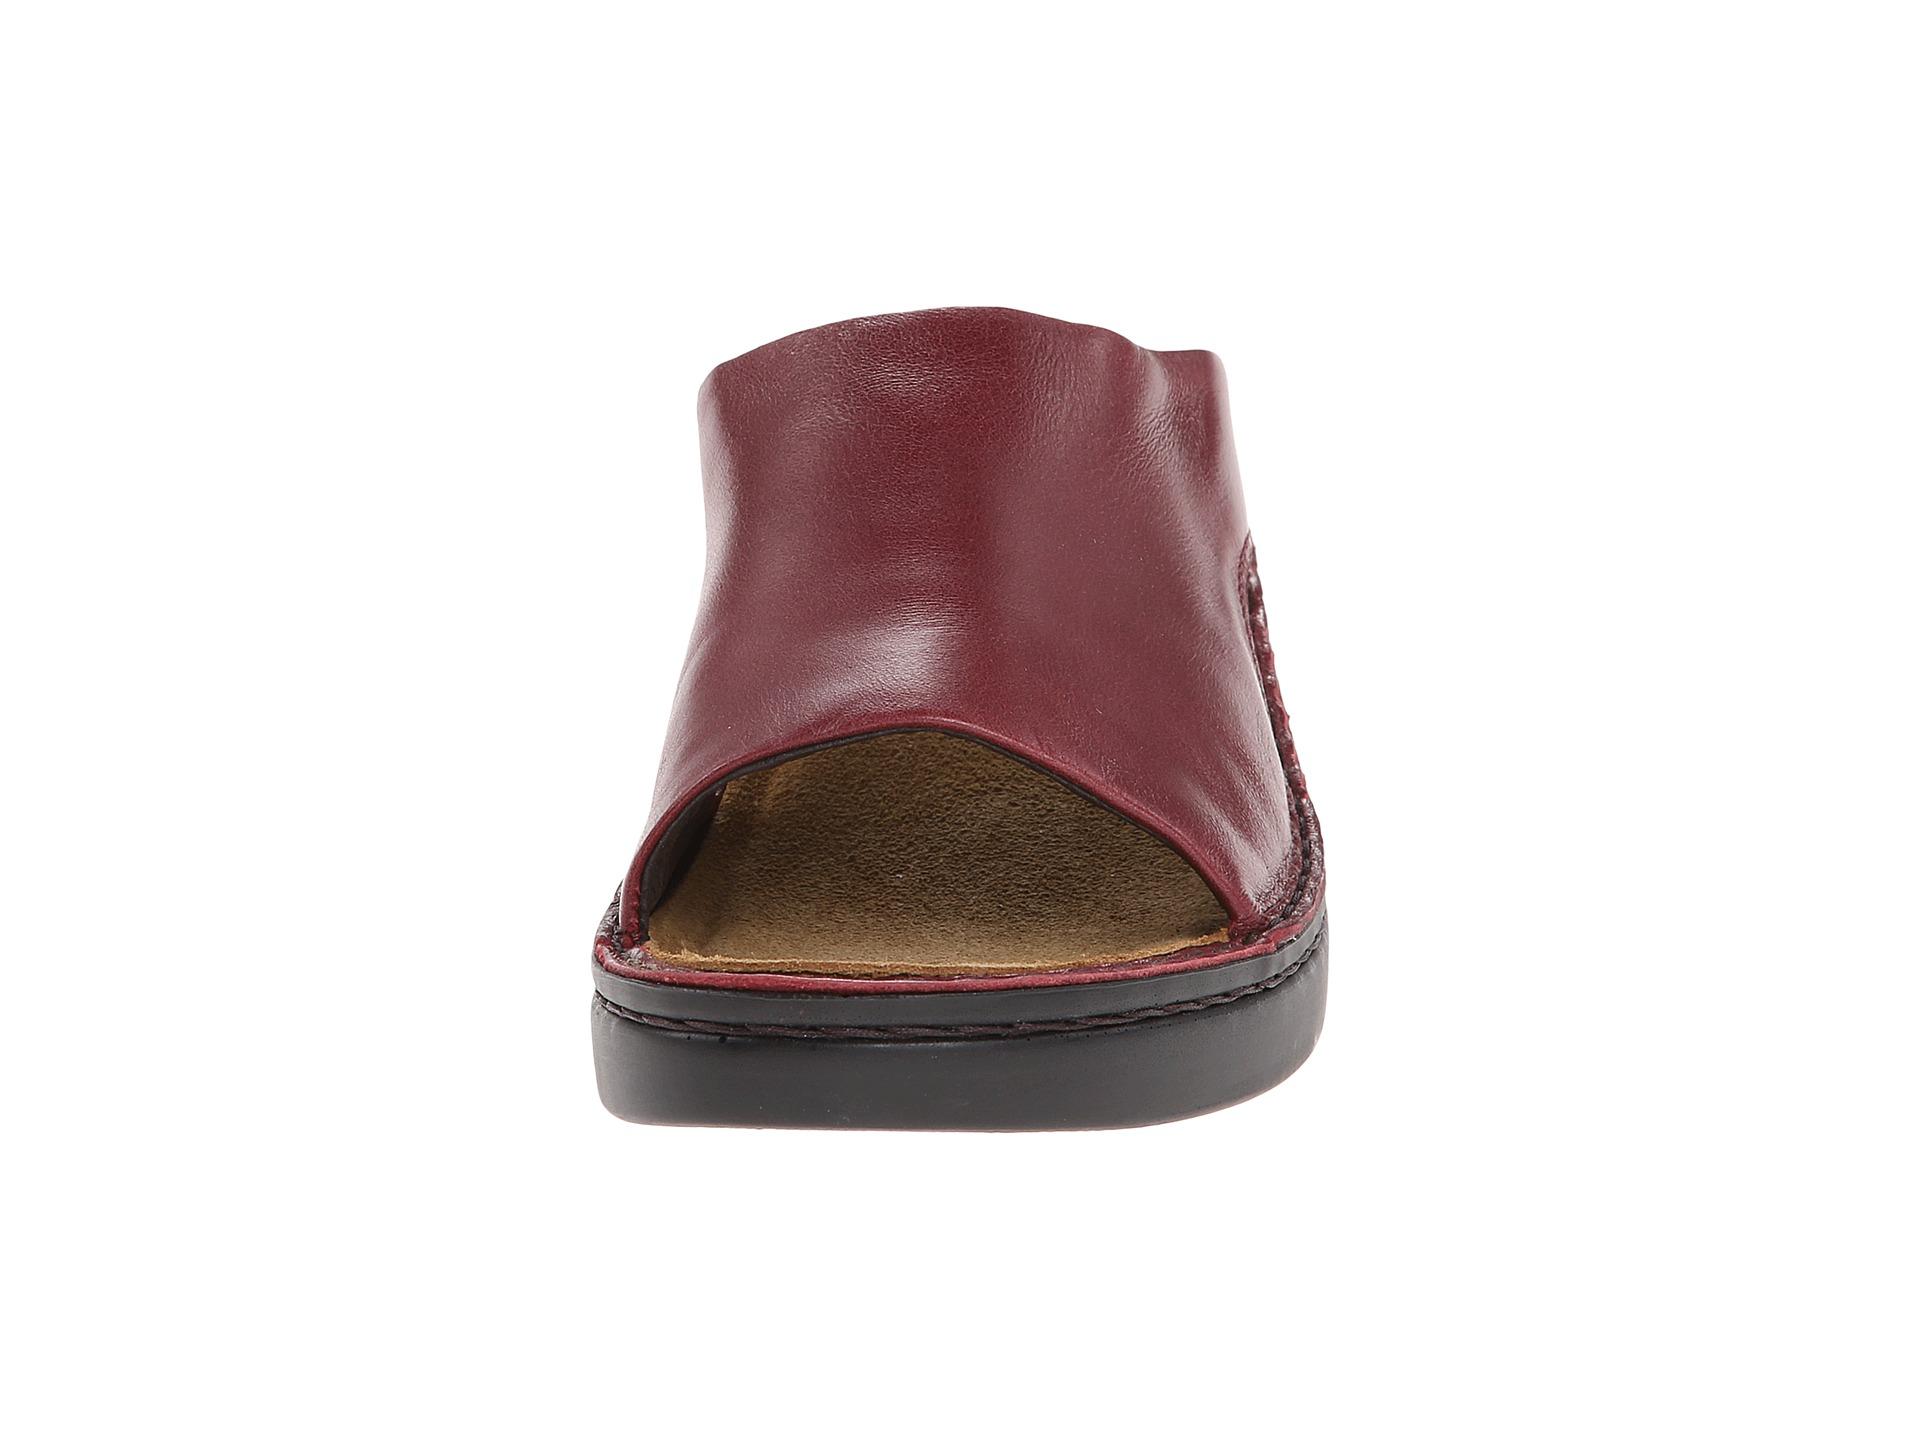 Naot Footwear Rome At Zappos Com